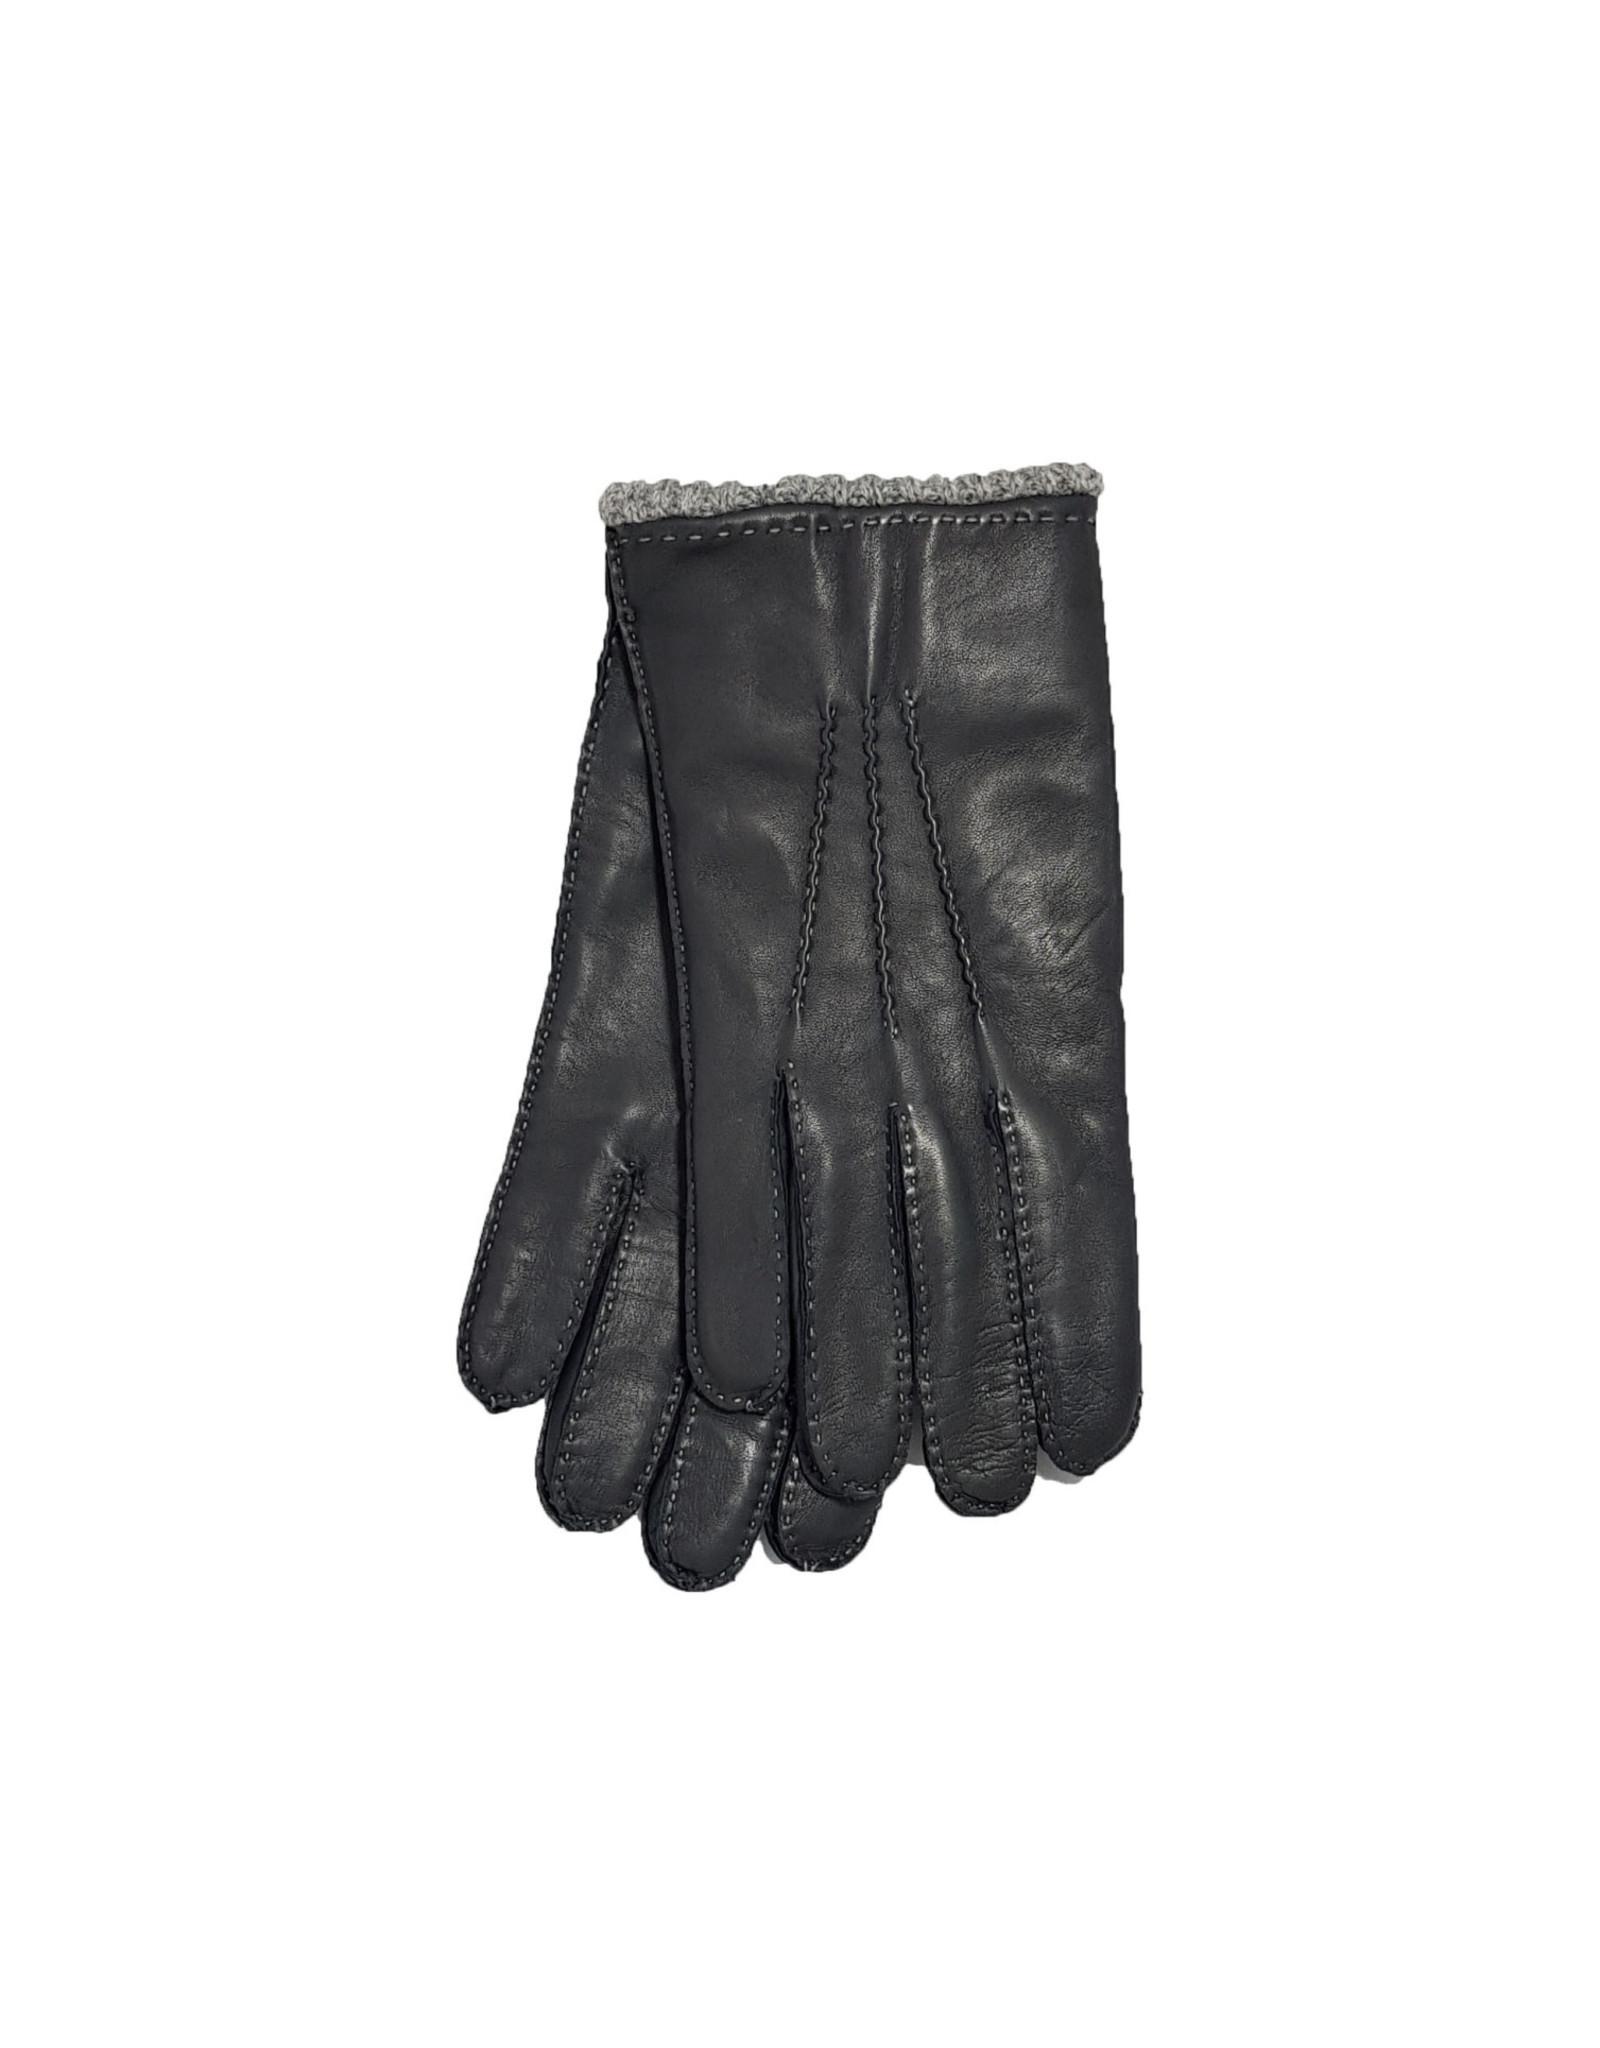 Mazzoleni Mazzoleni handschoenen leder grijs 904/4